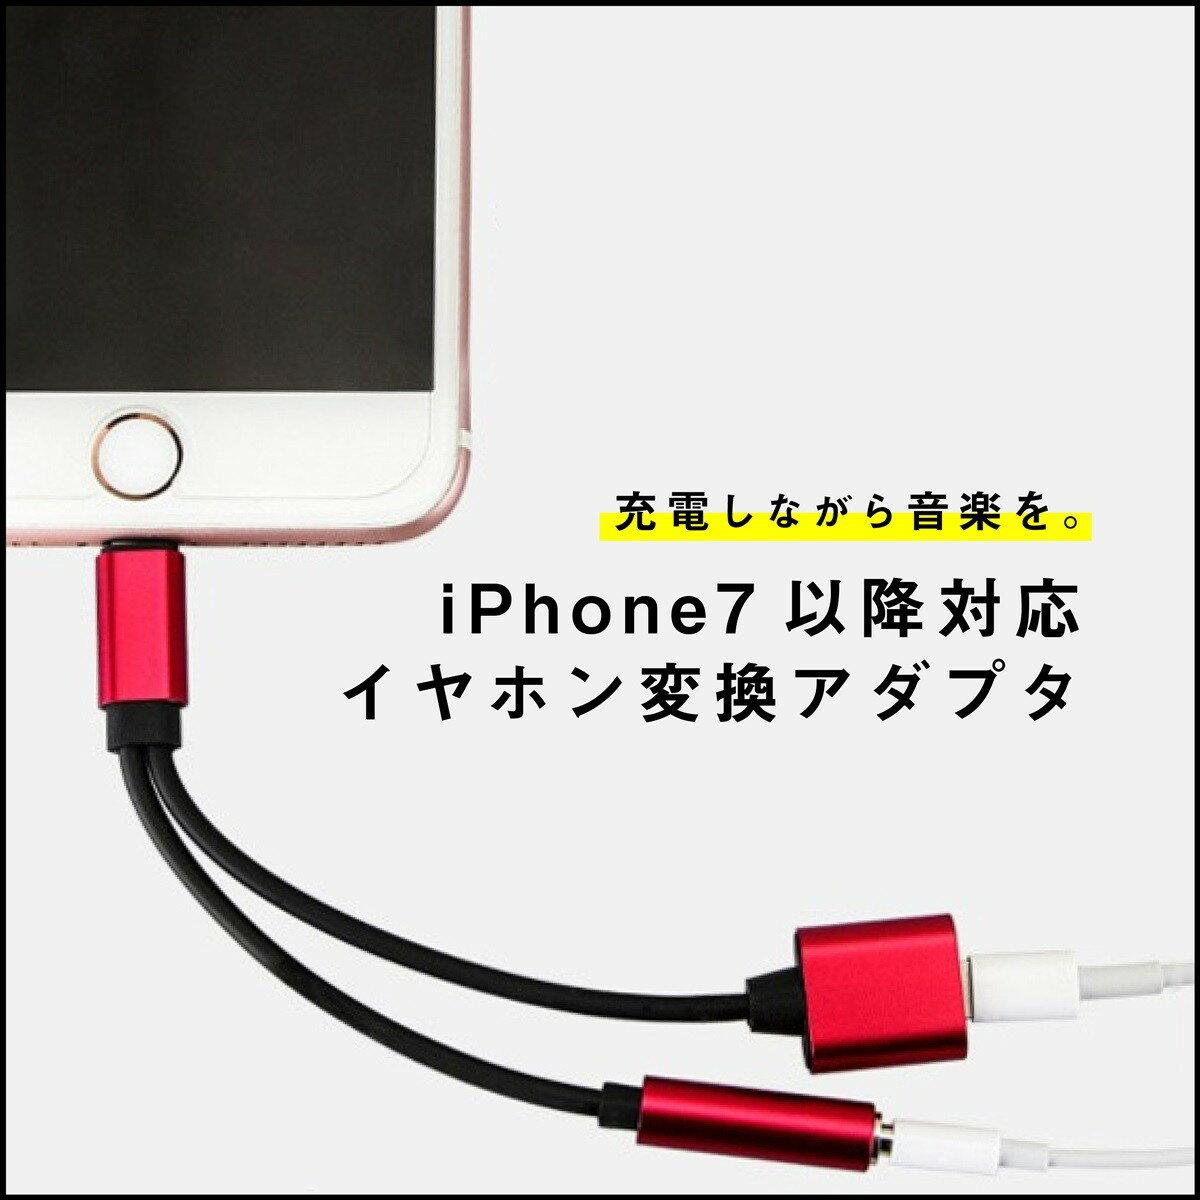 iPhone7 イヤホン 変換 ライトニングケーブル 3.5mm 2in1 変換アダプタ アイフォン 7/7plus iPhone 8/8plus iPhone X 音楽聞きながら充電